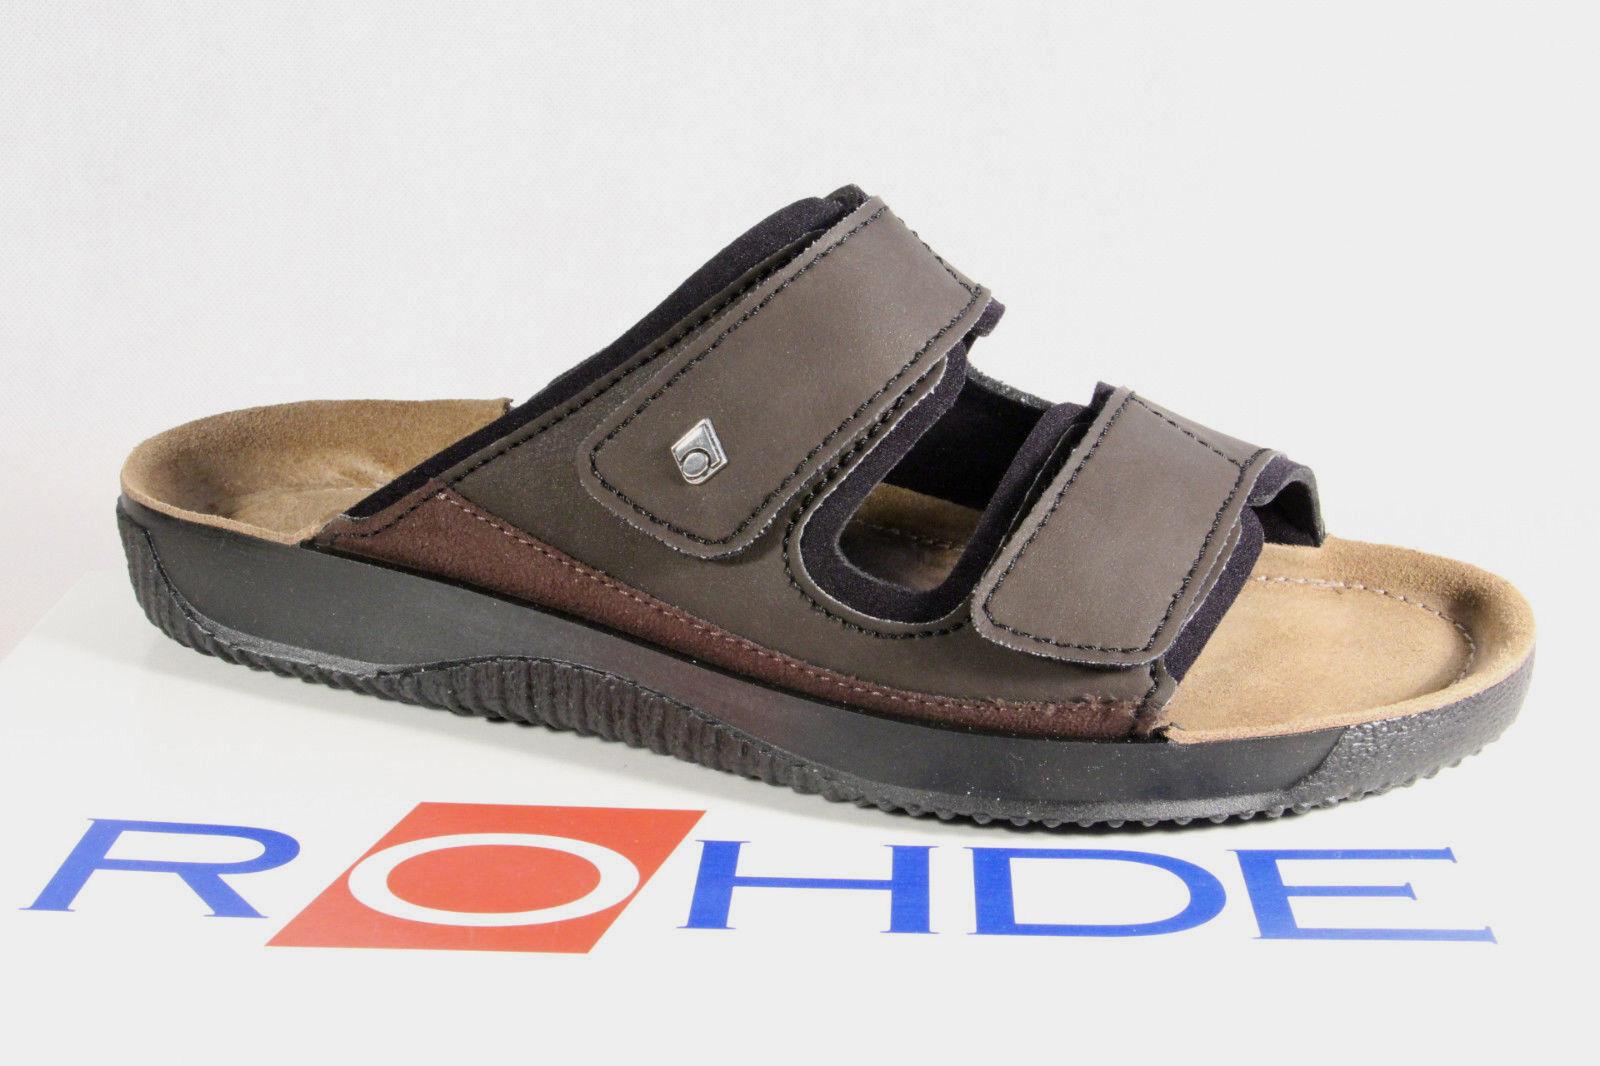 Rohde SANDALO UOMO pantofole zoccoli Marrone 1982 NUOVO